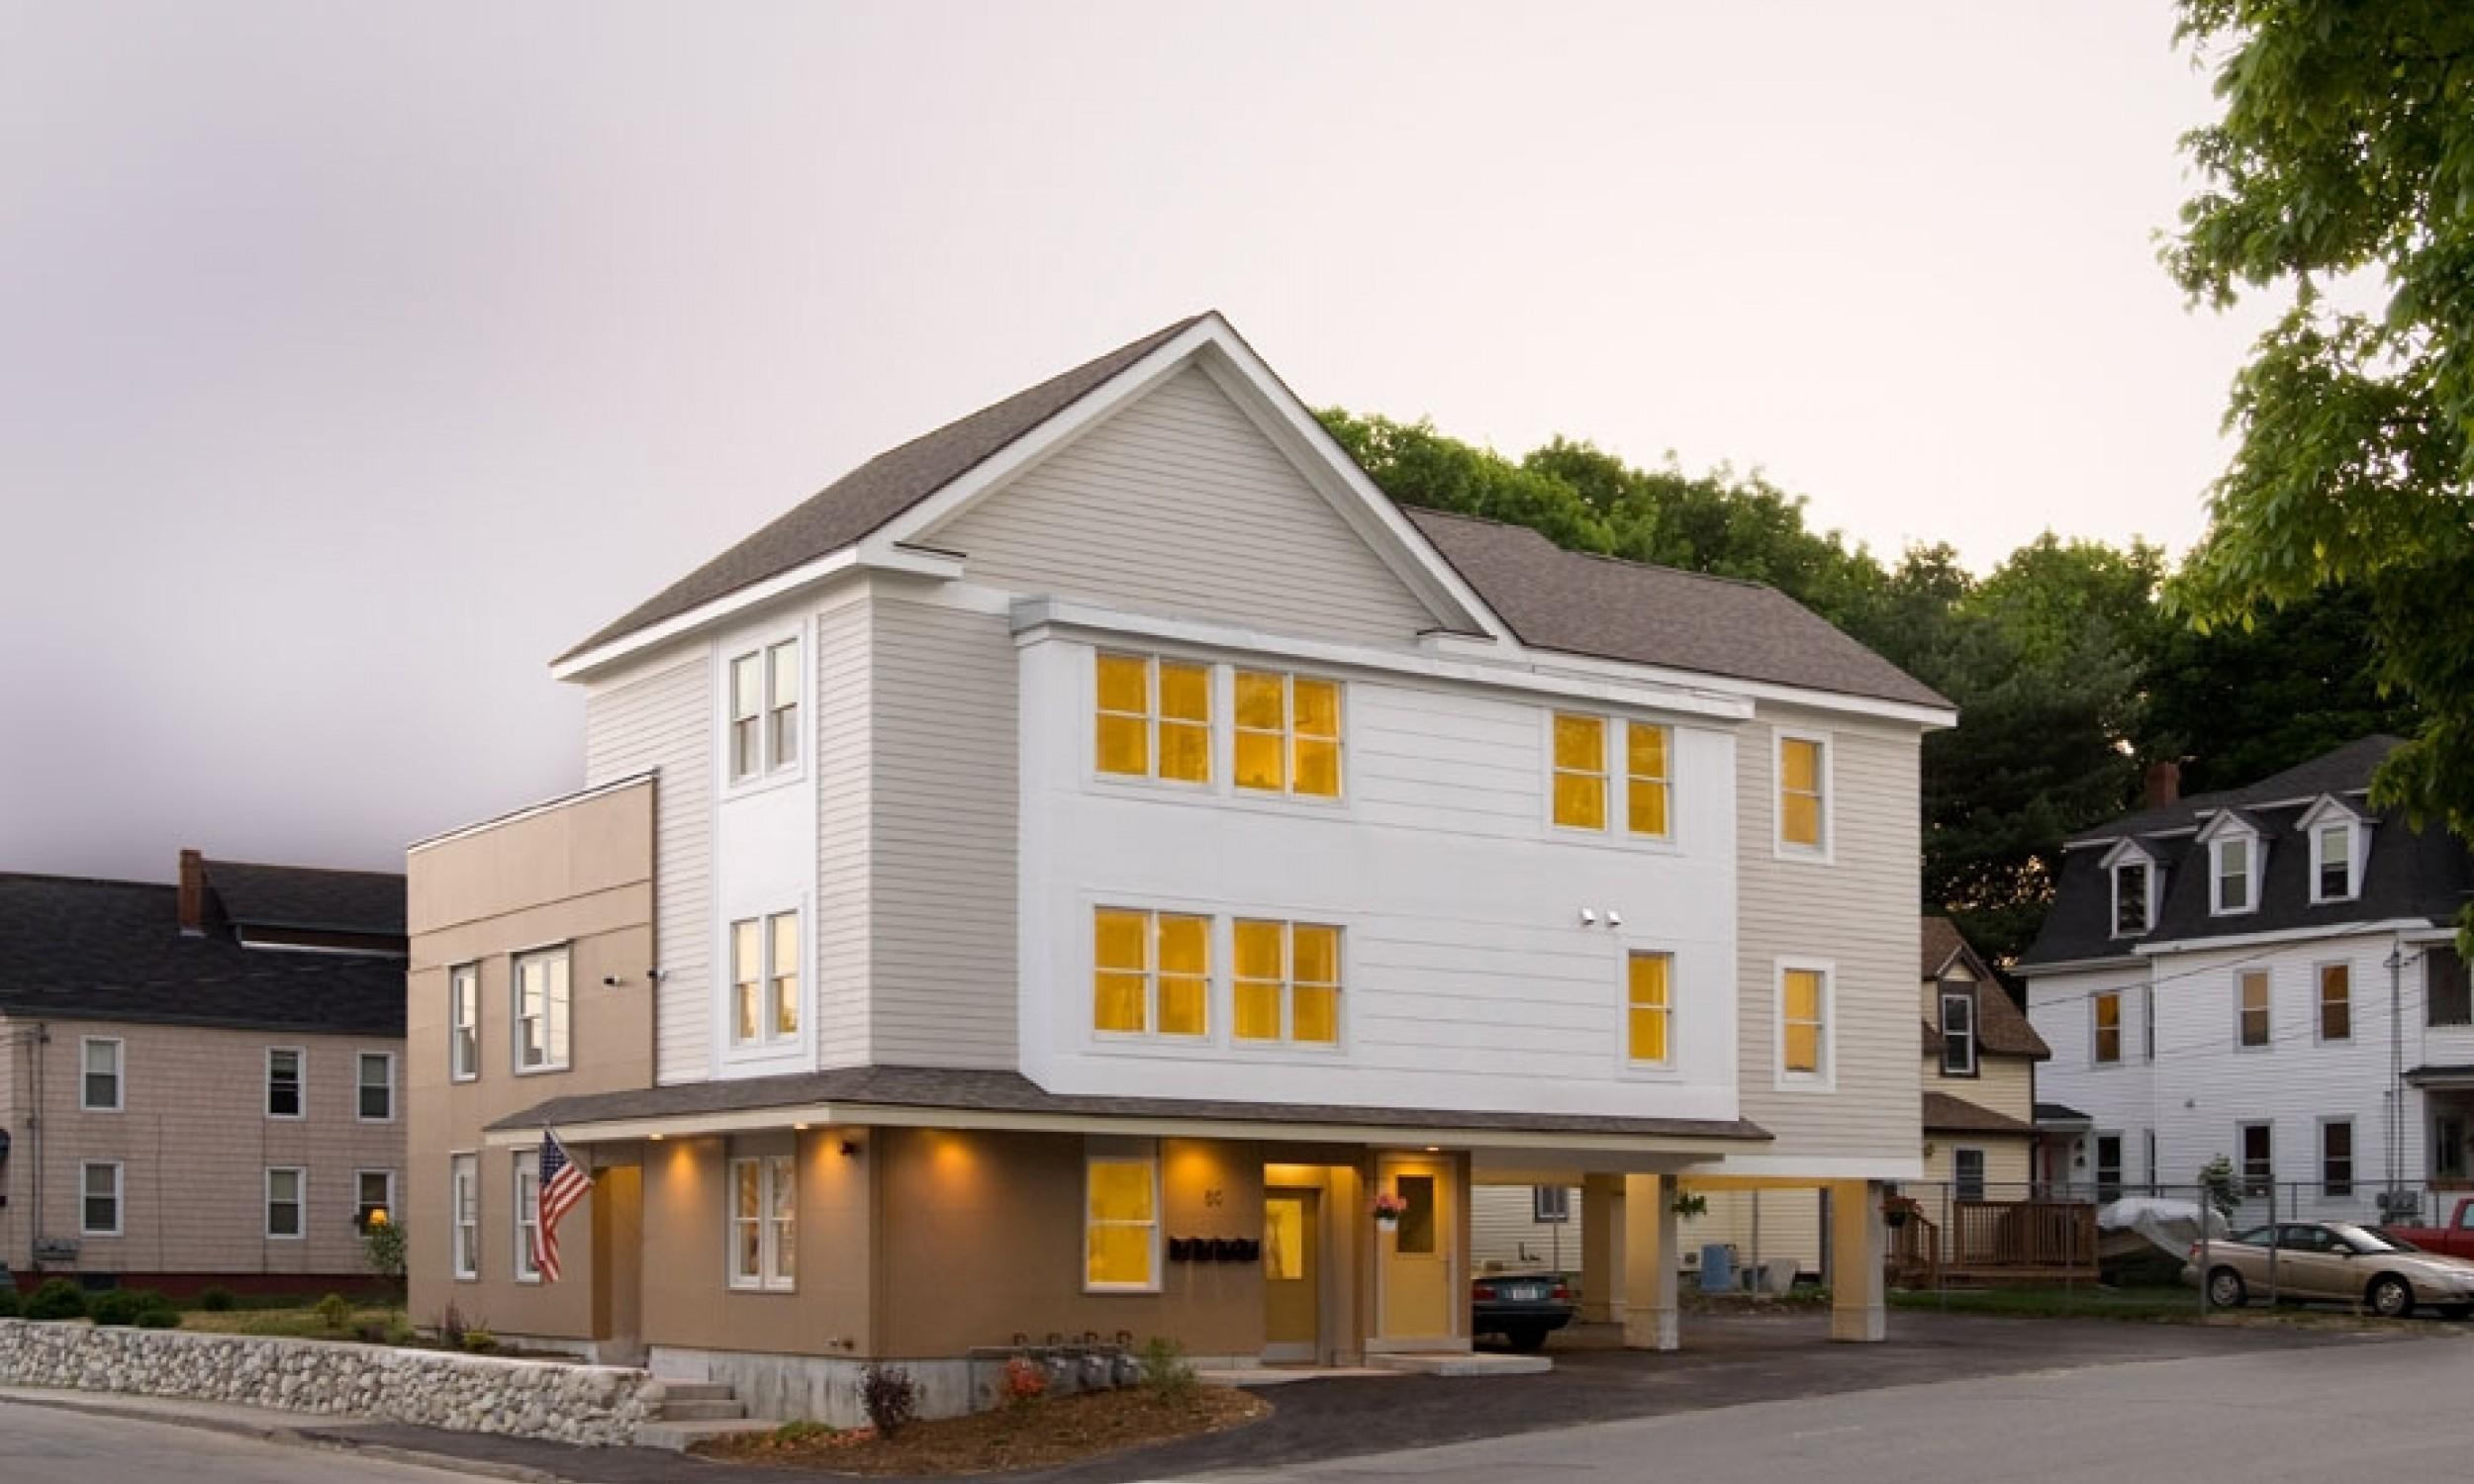 Apartment Building, Maine Architect, Carport, Andersen Windows